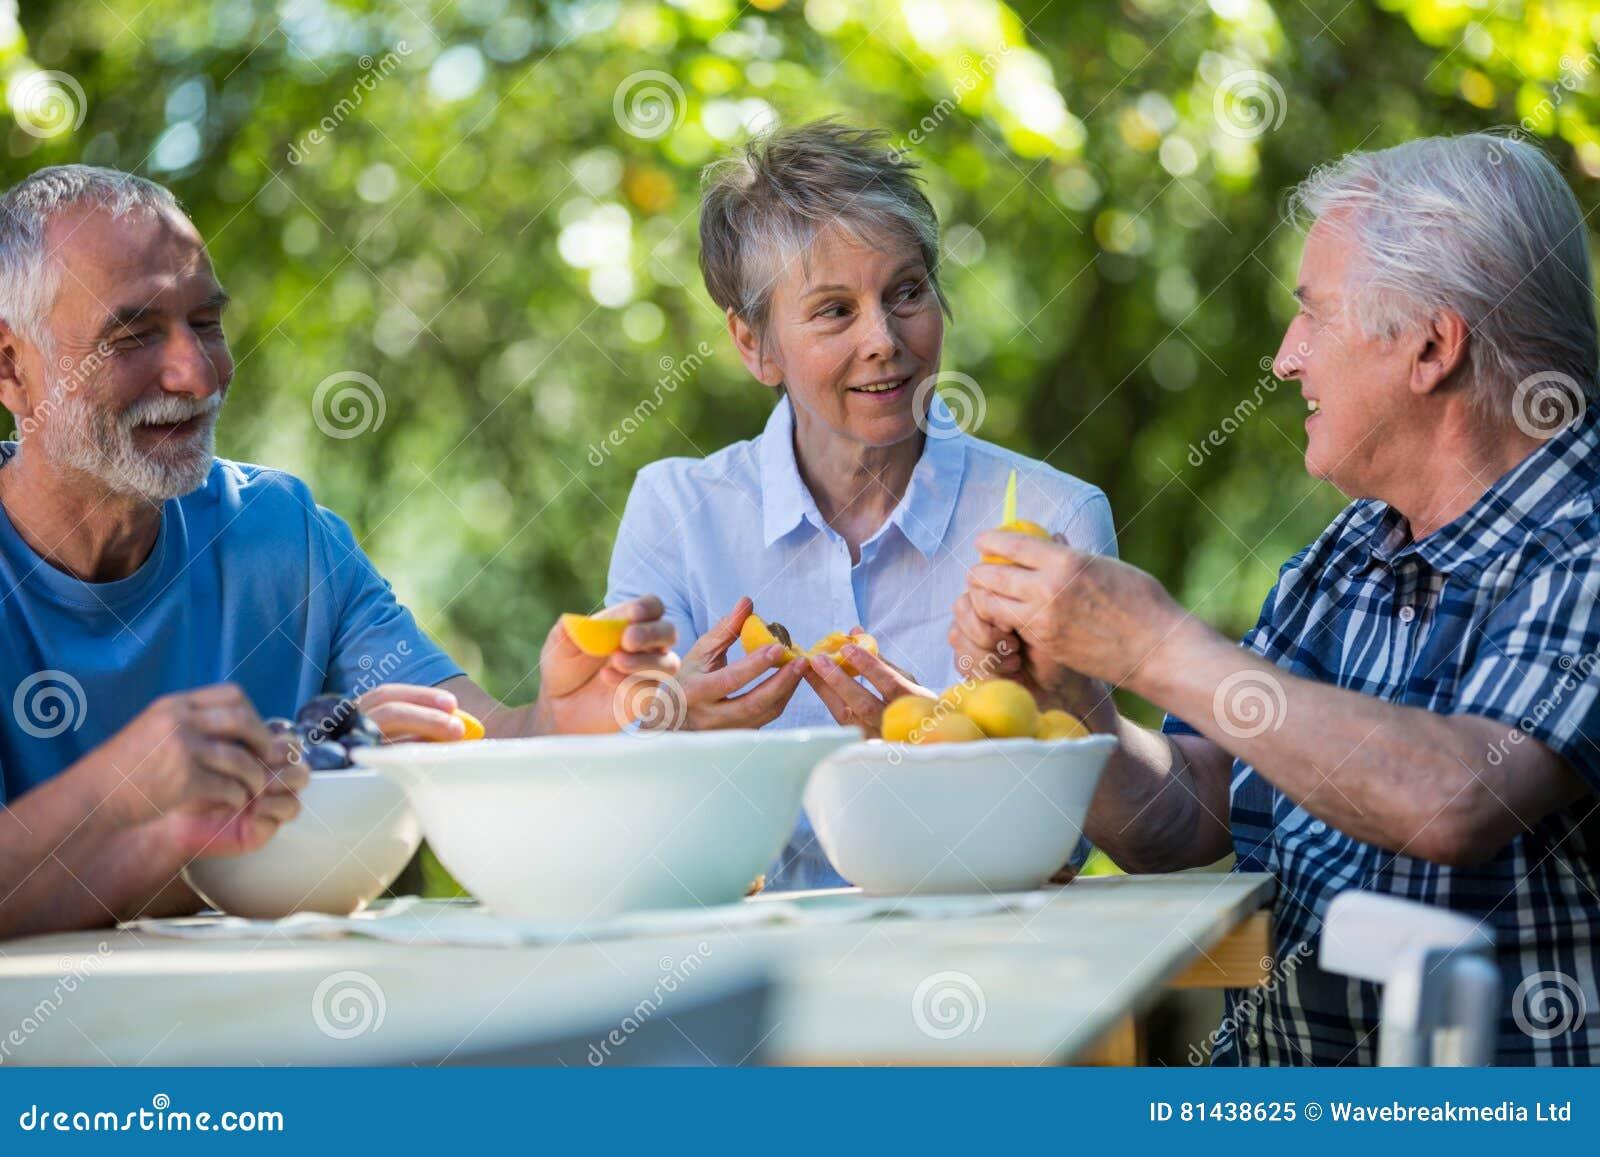 Hogere paren die zaden van abrikozenvruchten verwijderen in tuin